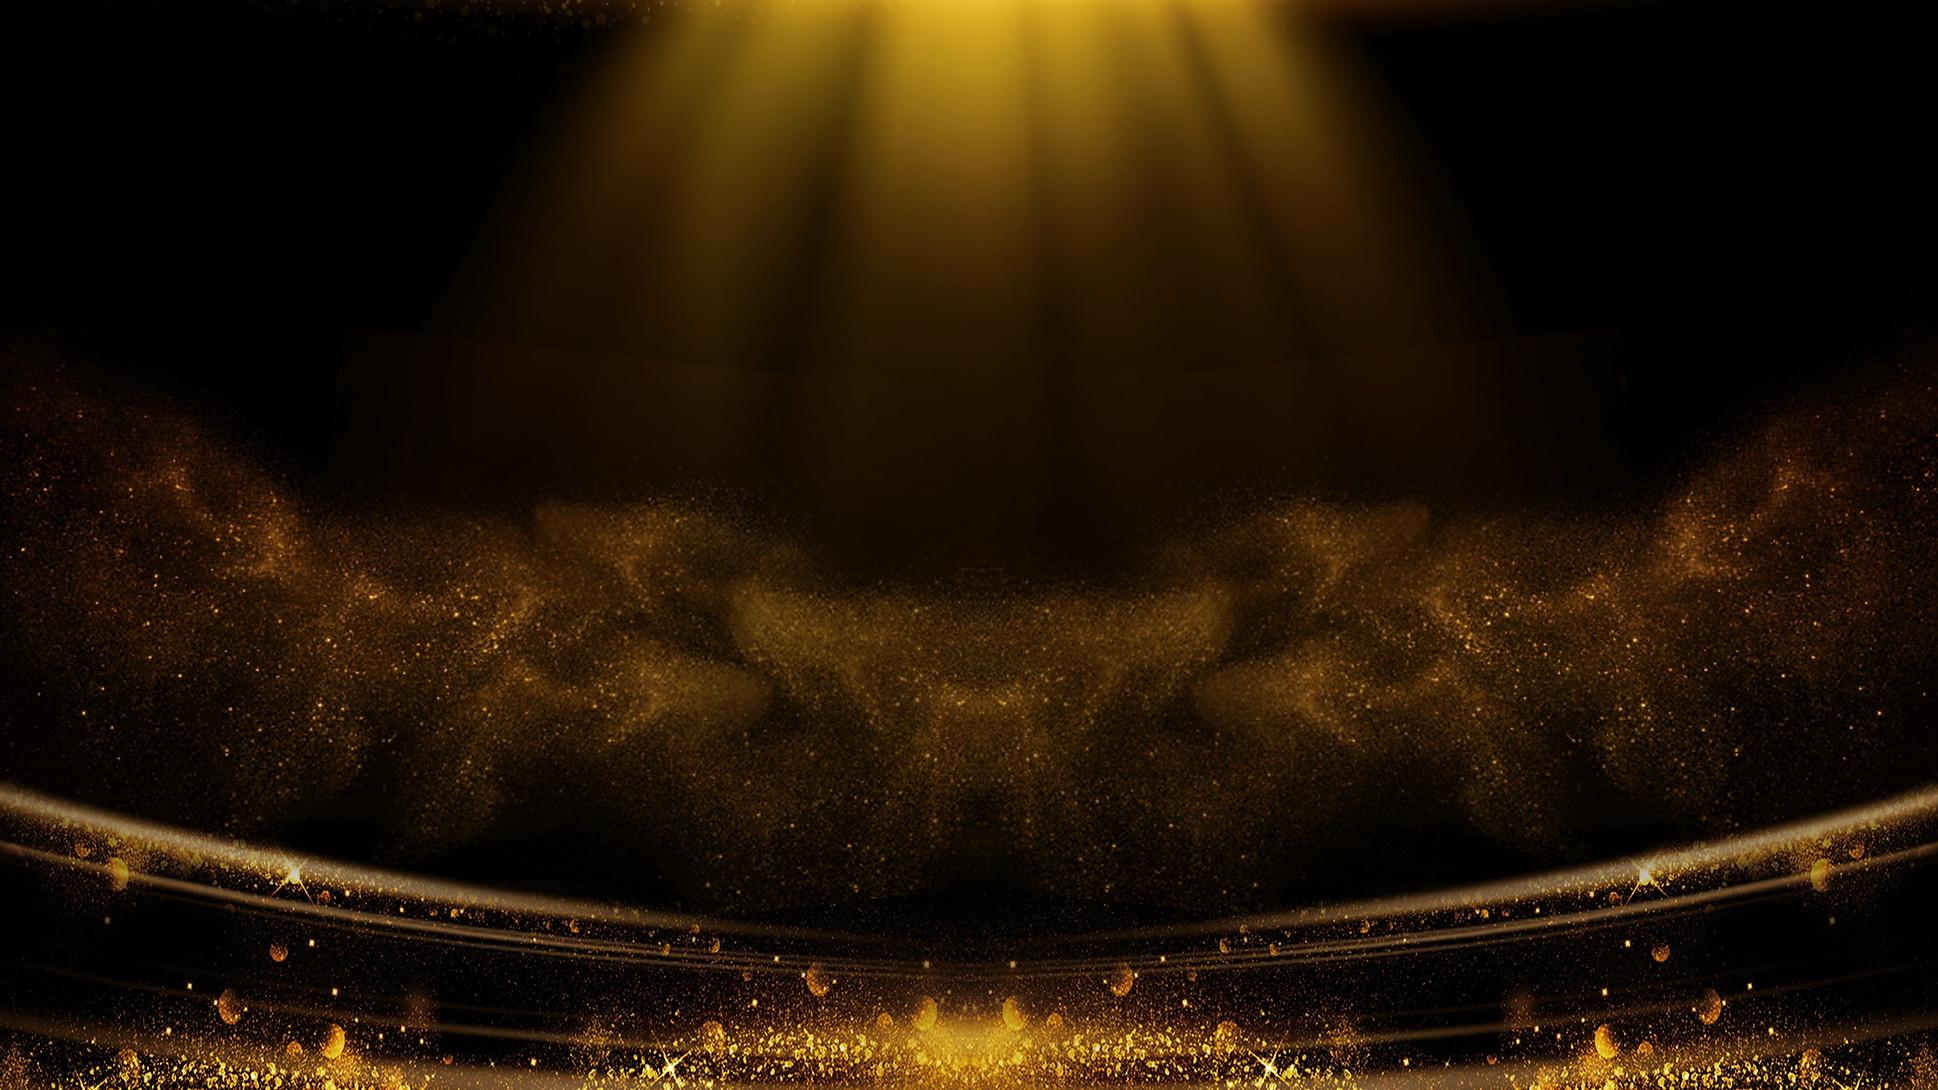 —Pngtree—award ceremony black gold style